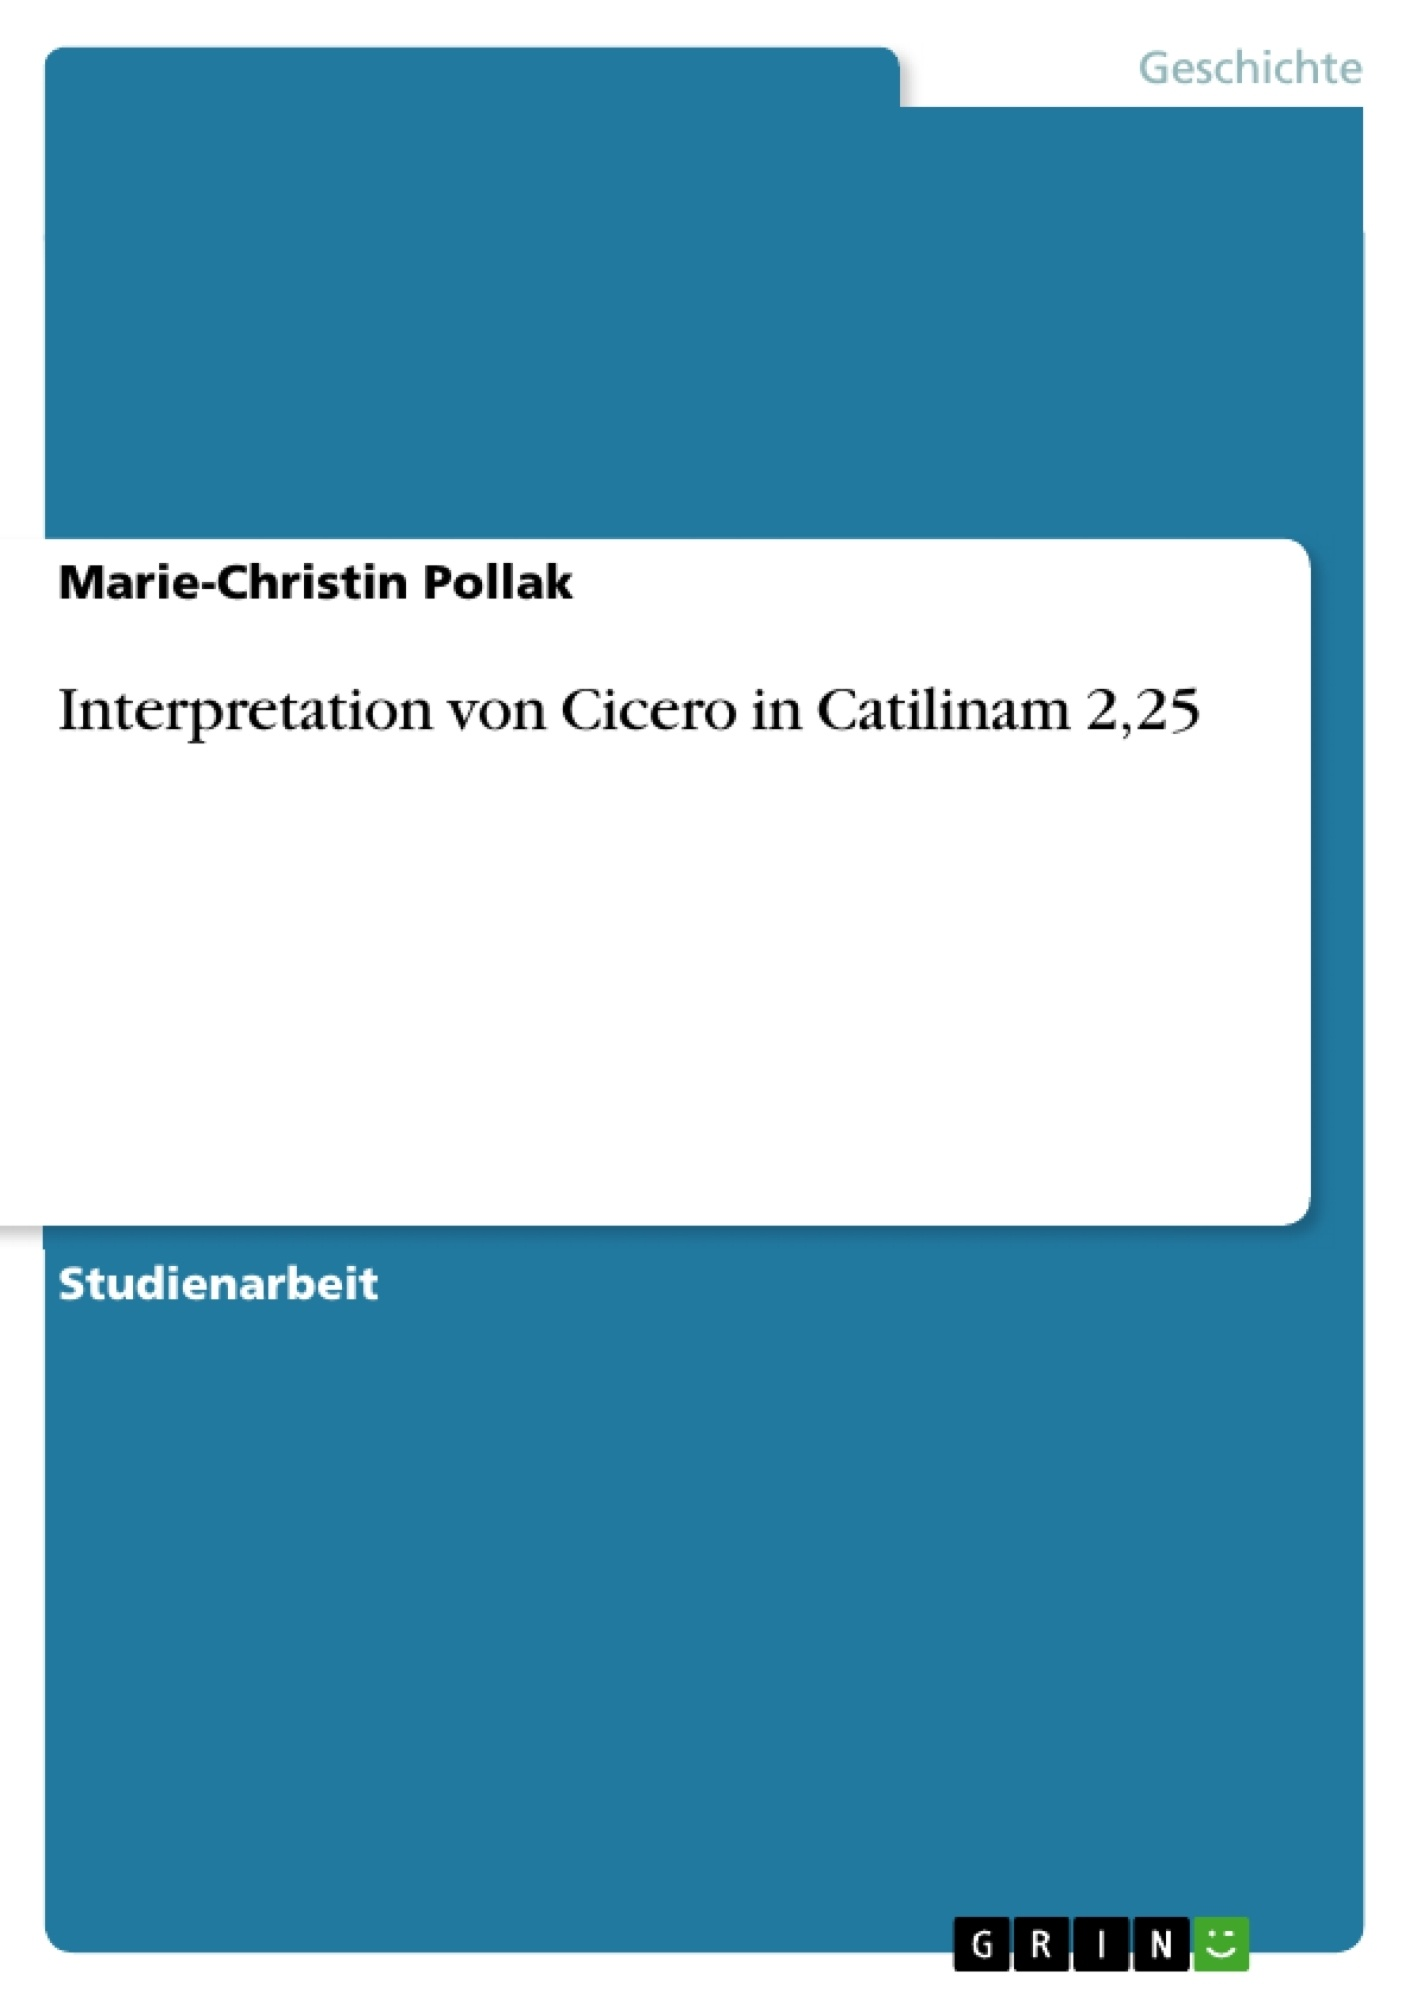 Titel: Interpretation von Cicero in Catilinam 2,25